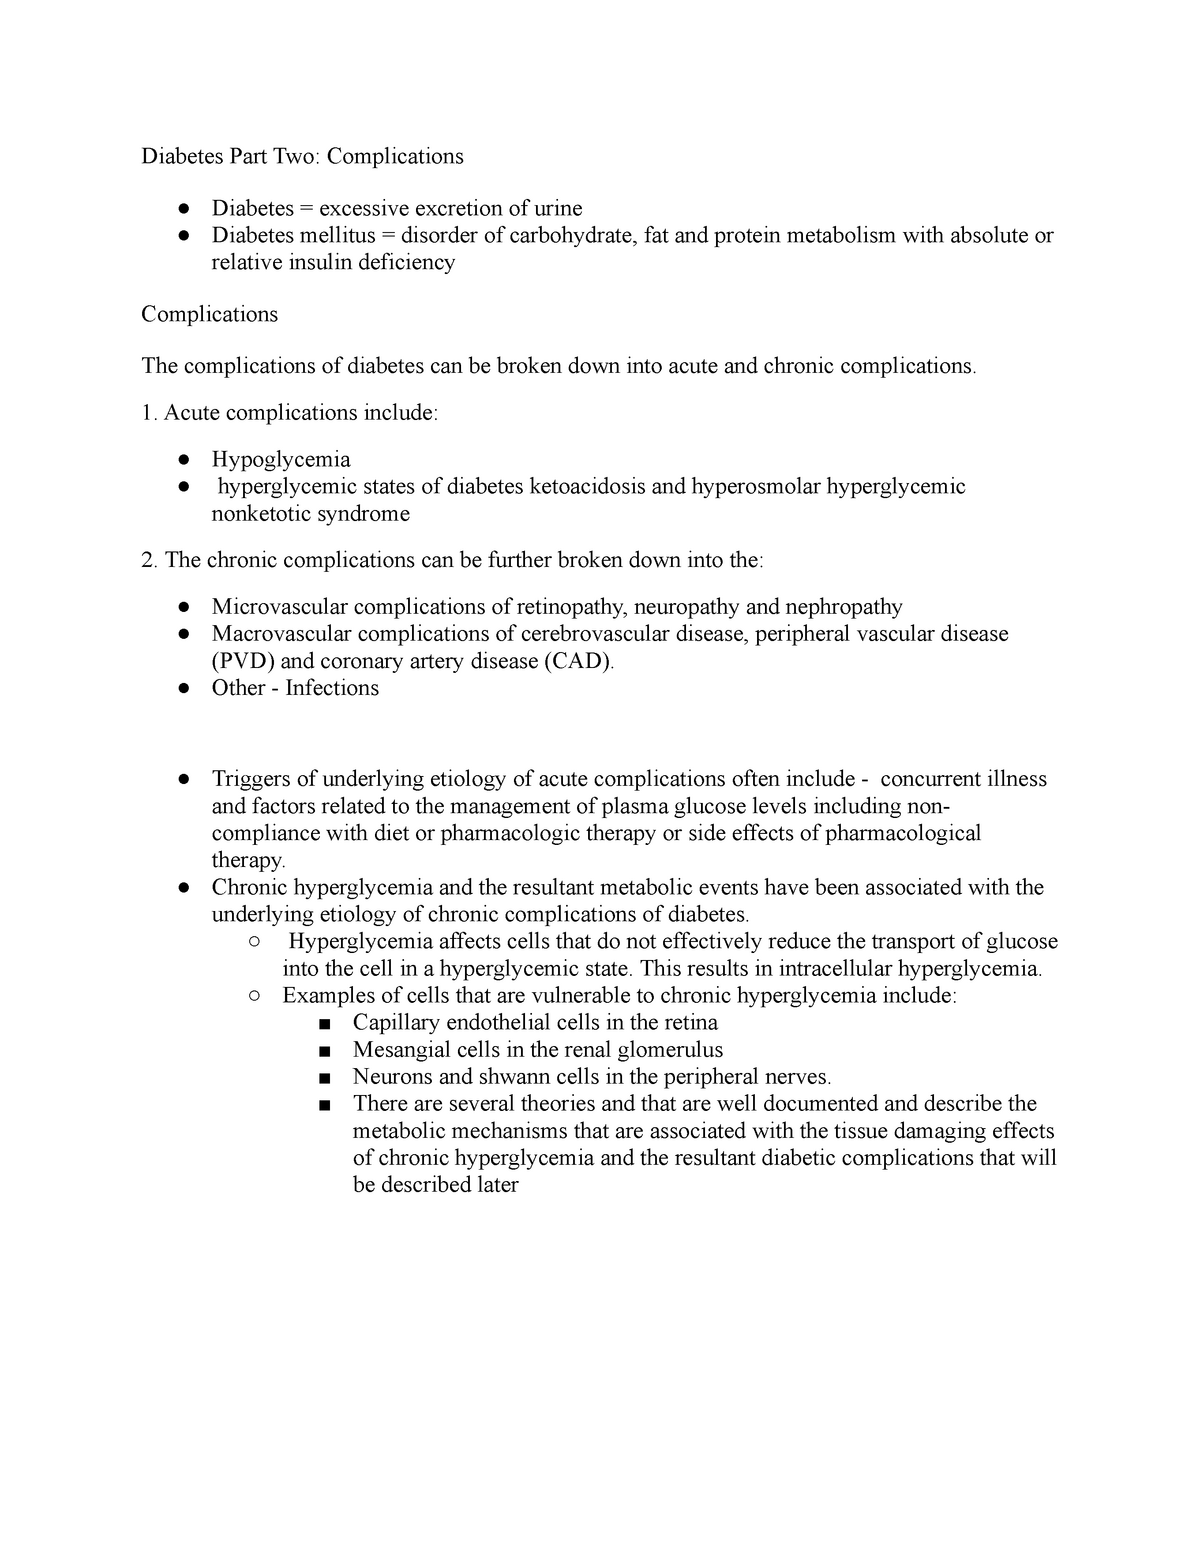 Lecture notes, lecture Diabetes Part Two: Complications